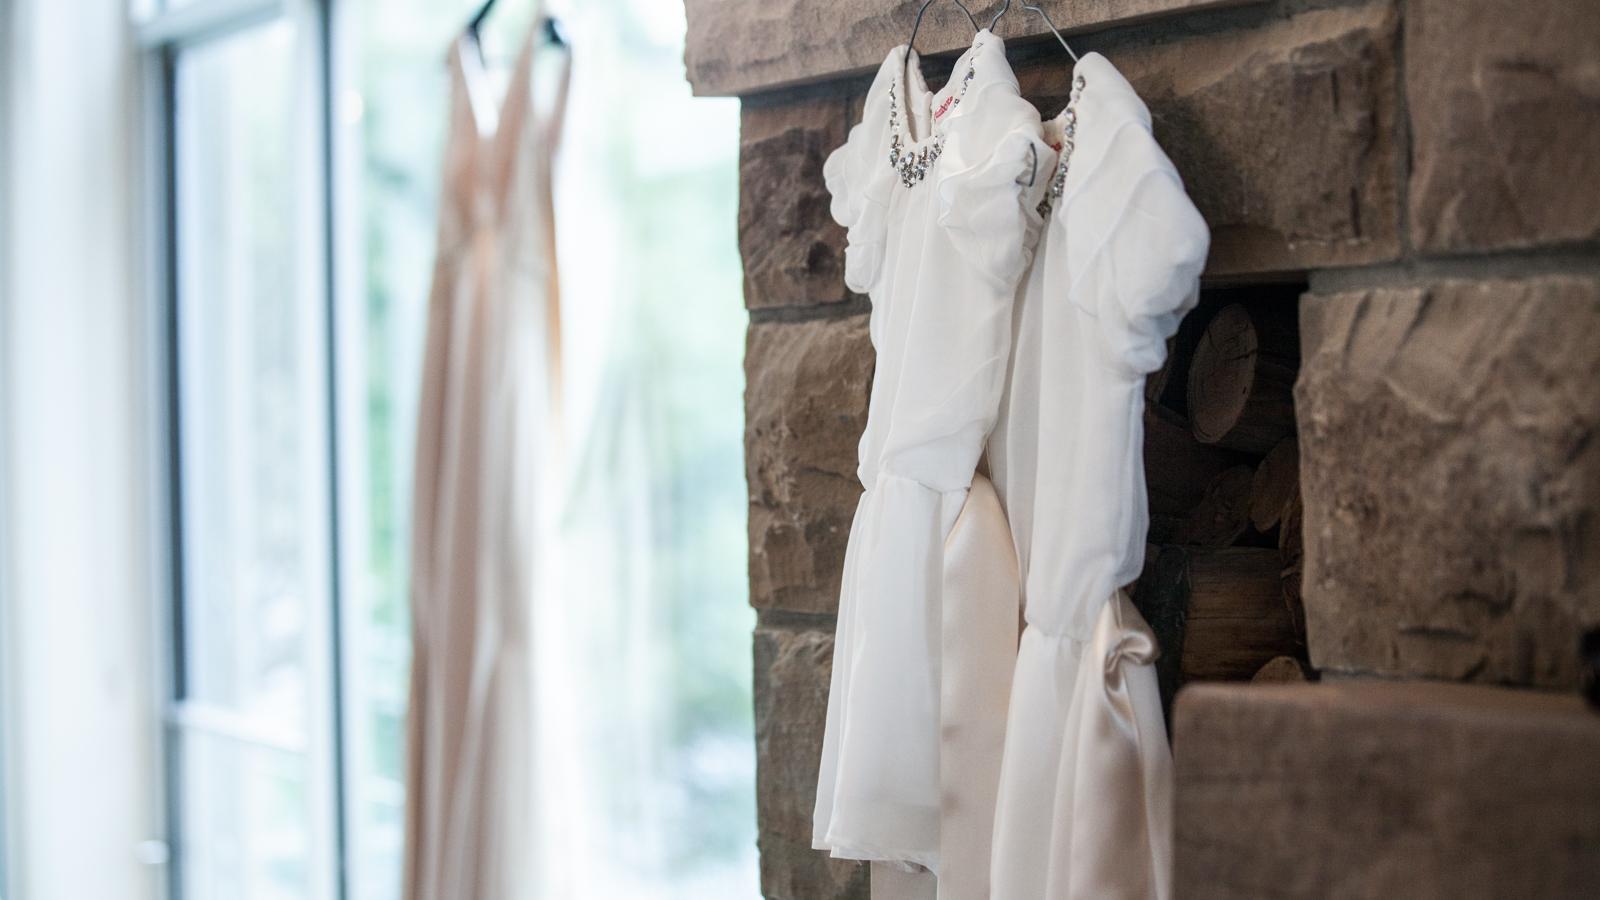 Flower Girl Dress Wedding Dress Thredbo Resort Simon Pollock Wedding Photography